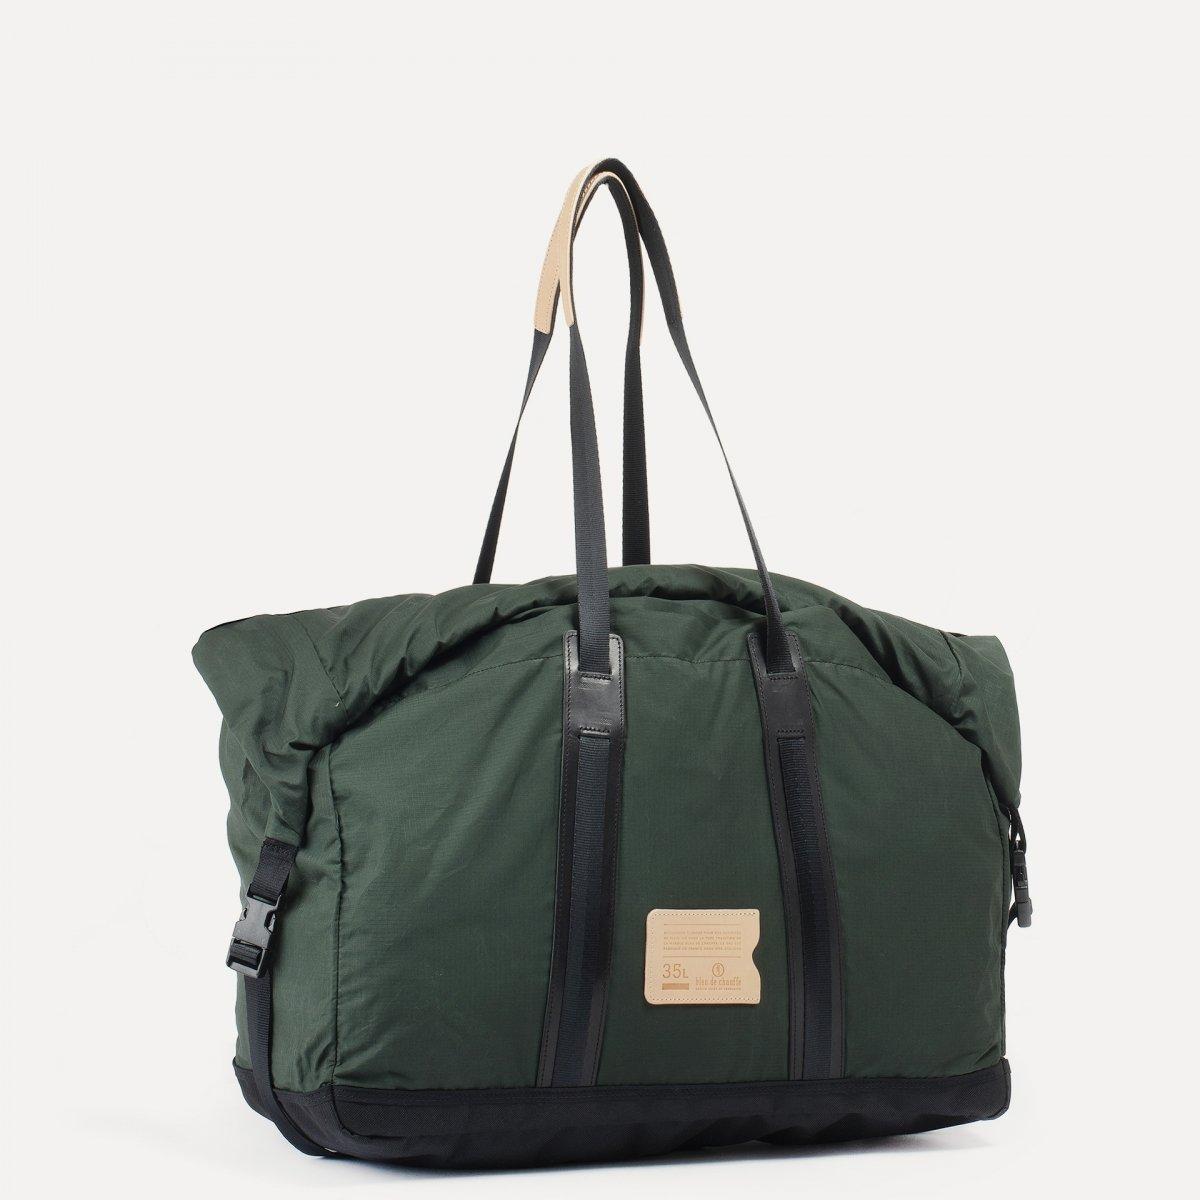 35L Baroud Travel bag - Dark Khaki (image n°2)